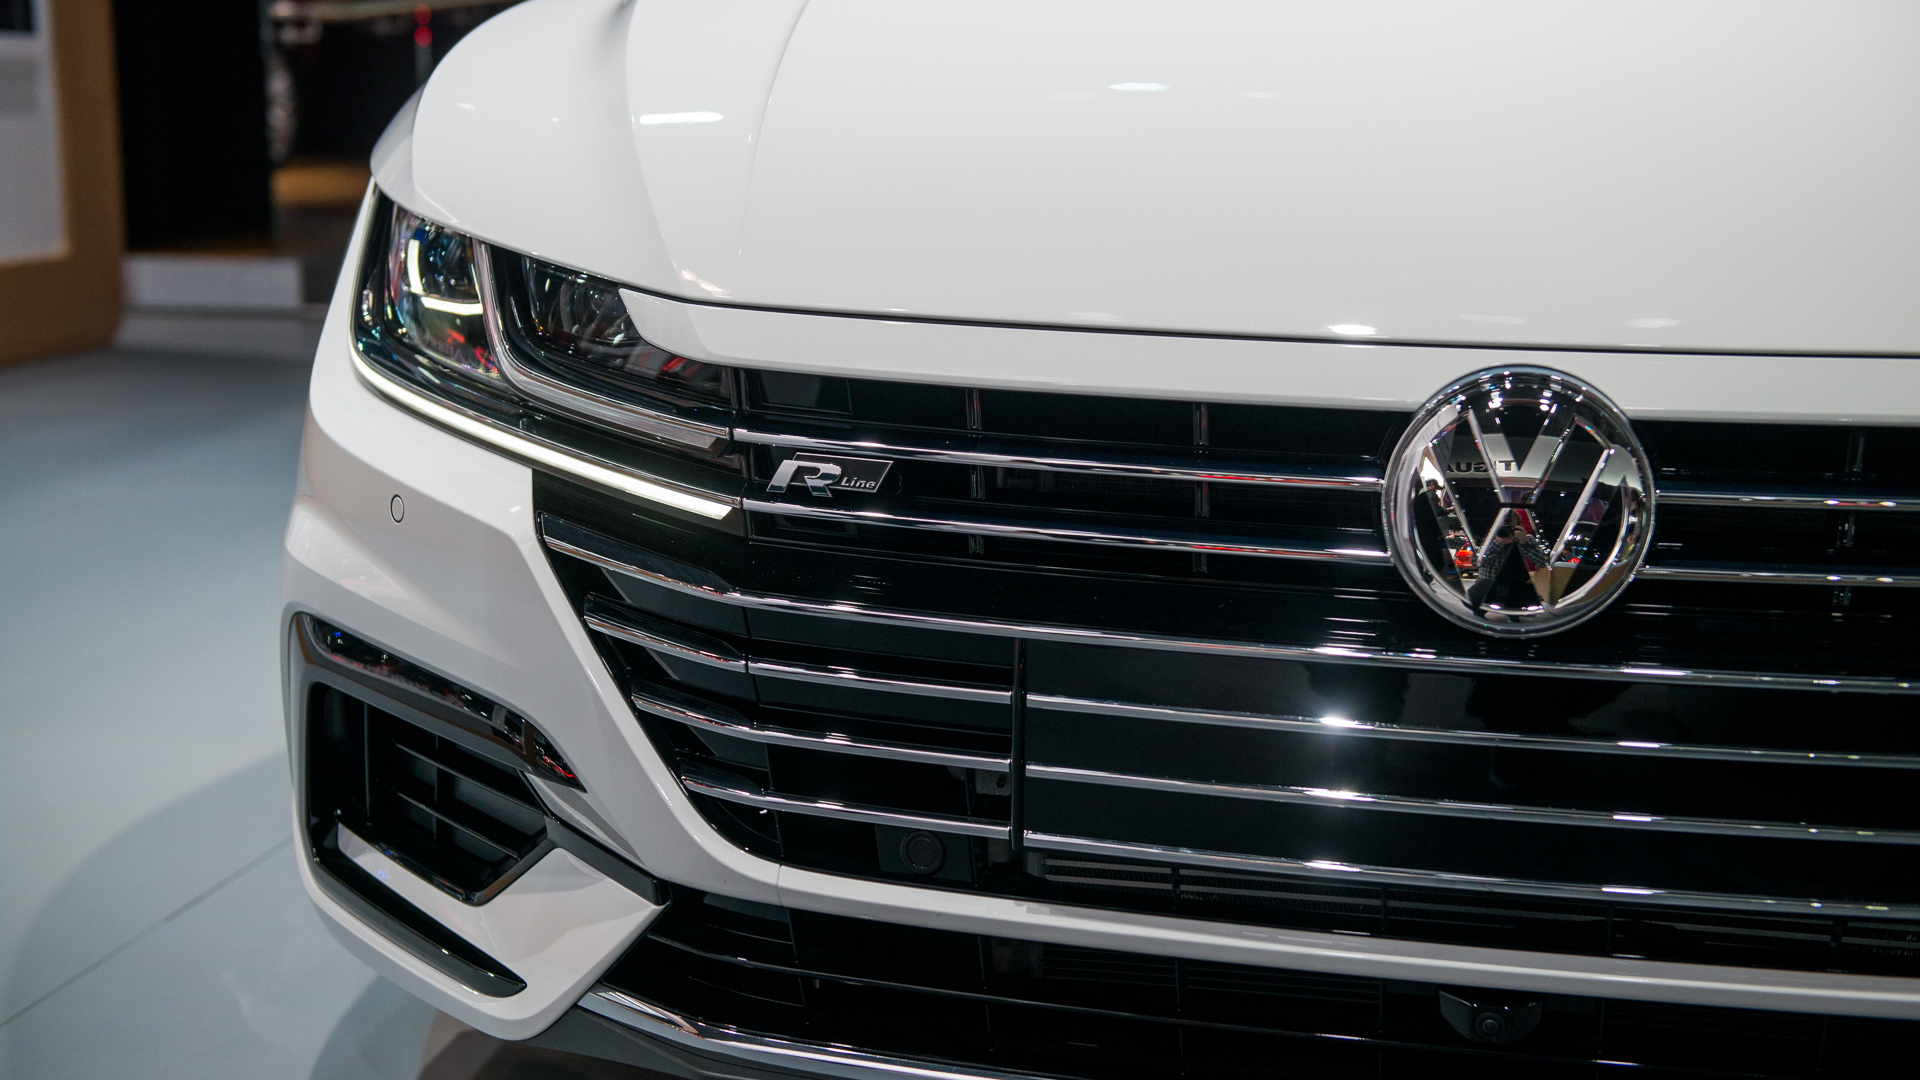 2019 Volkswaen Arteon R-Line, 2018 New York auto show